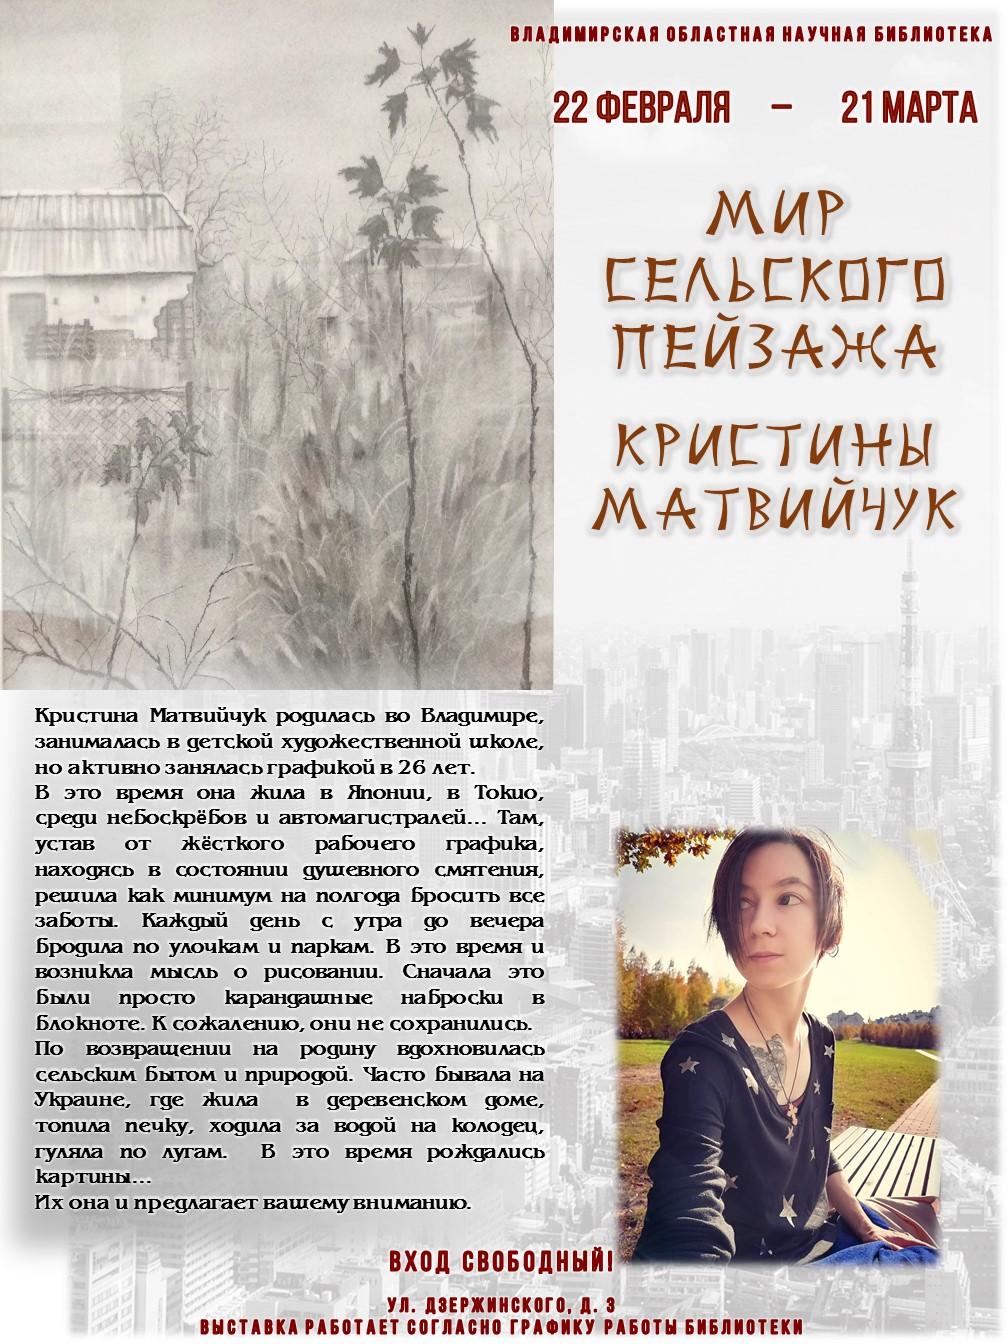 Кристина Матвийчук - выставка афиша